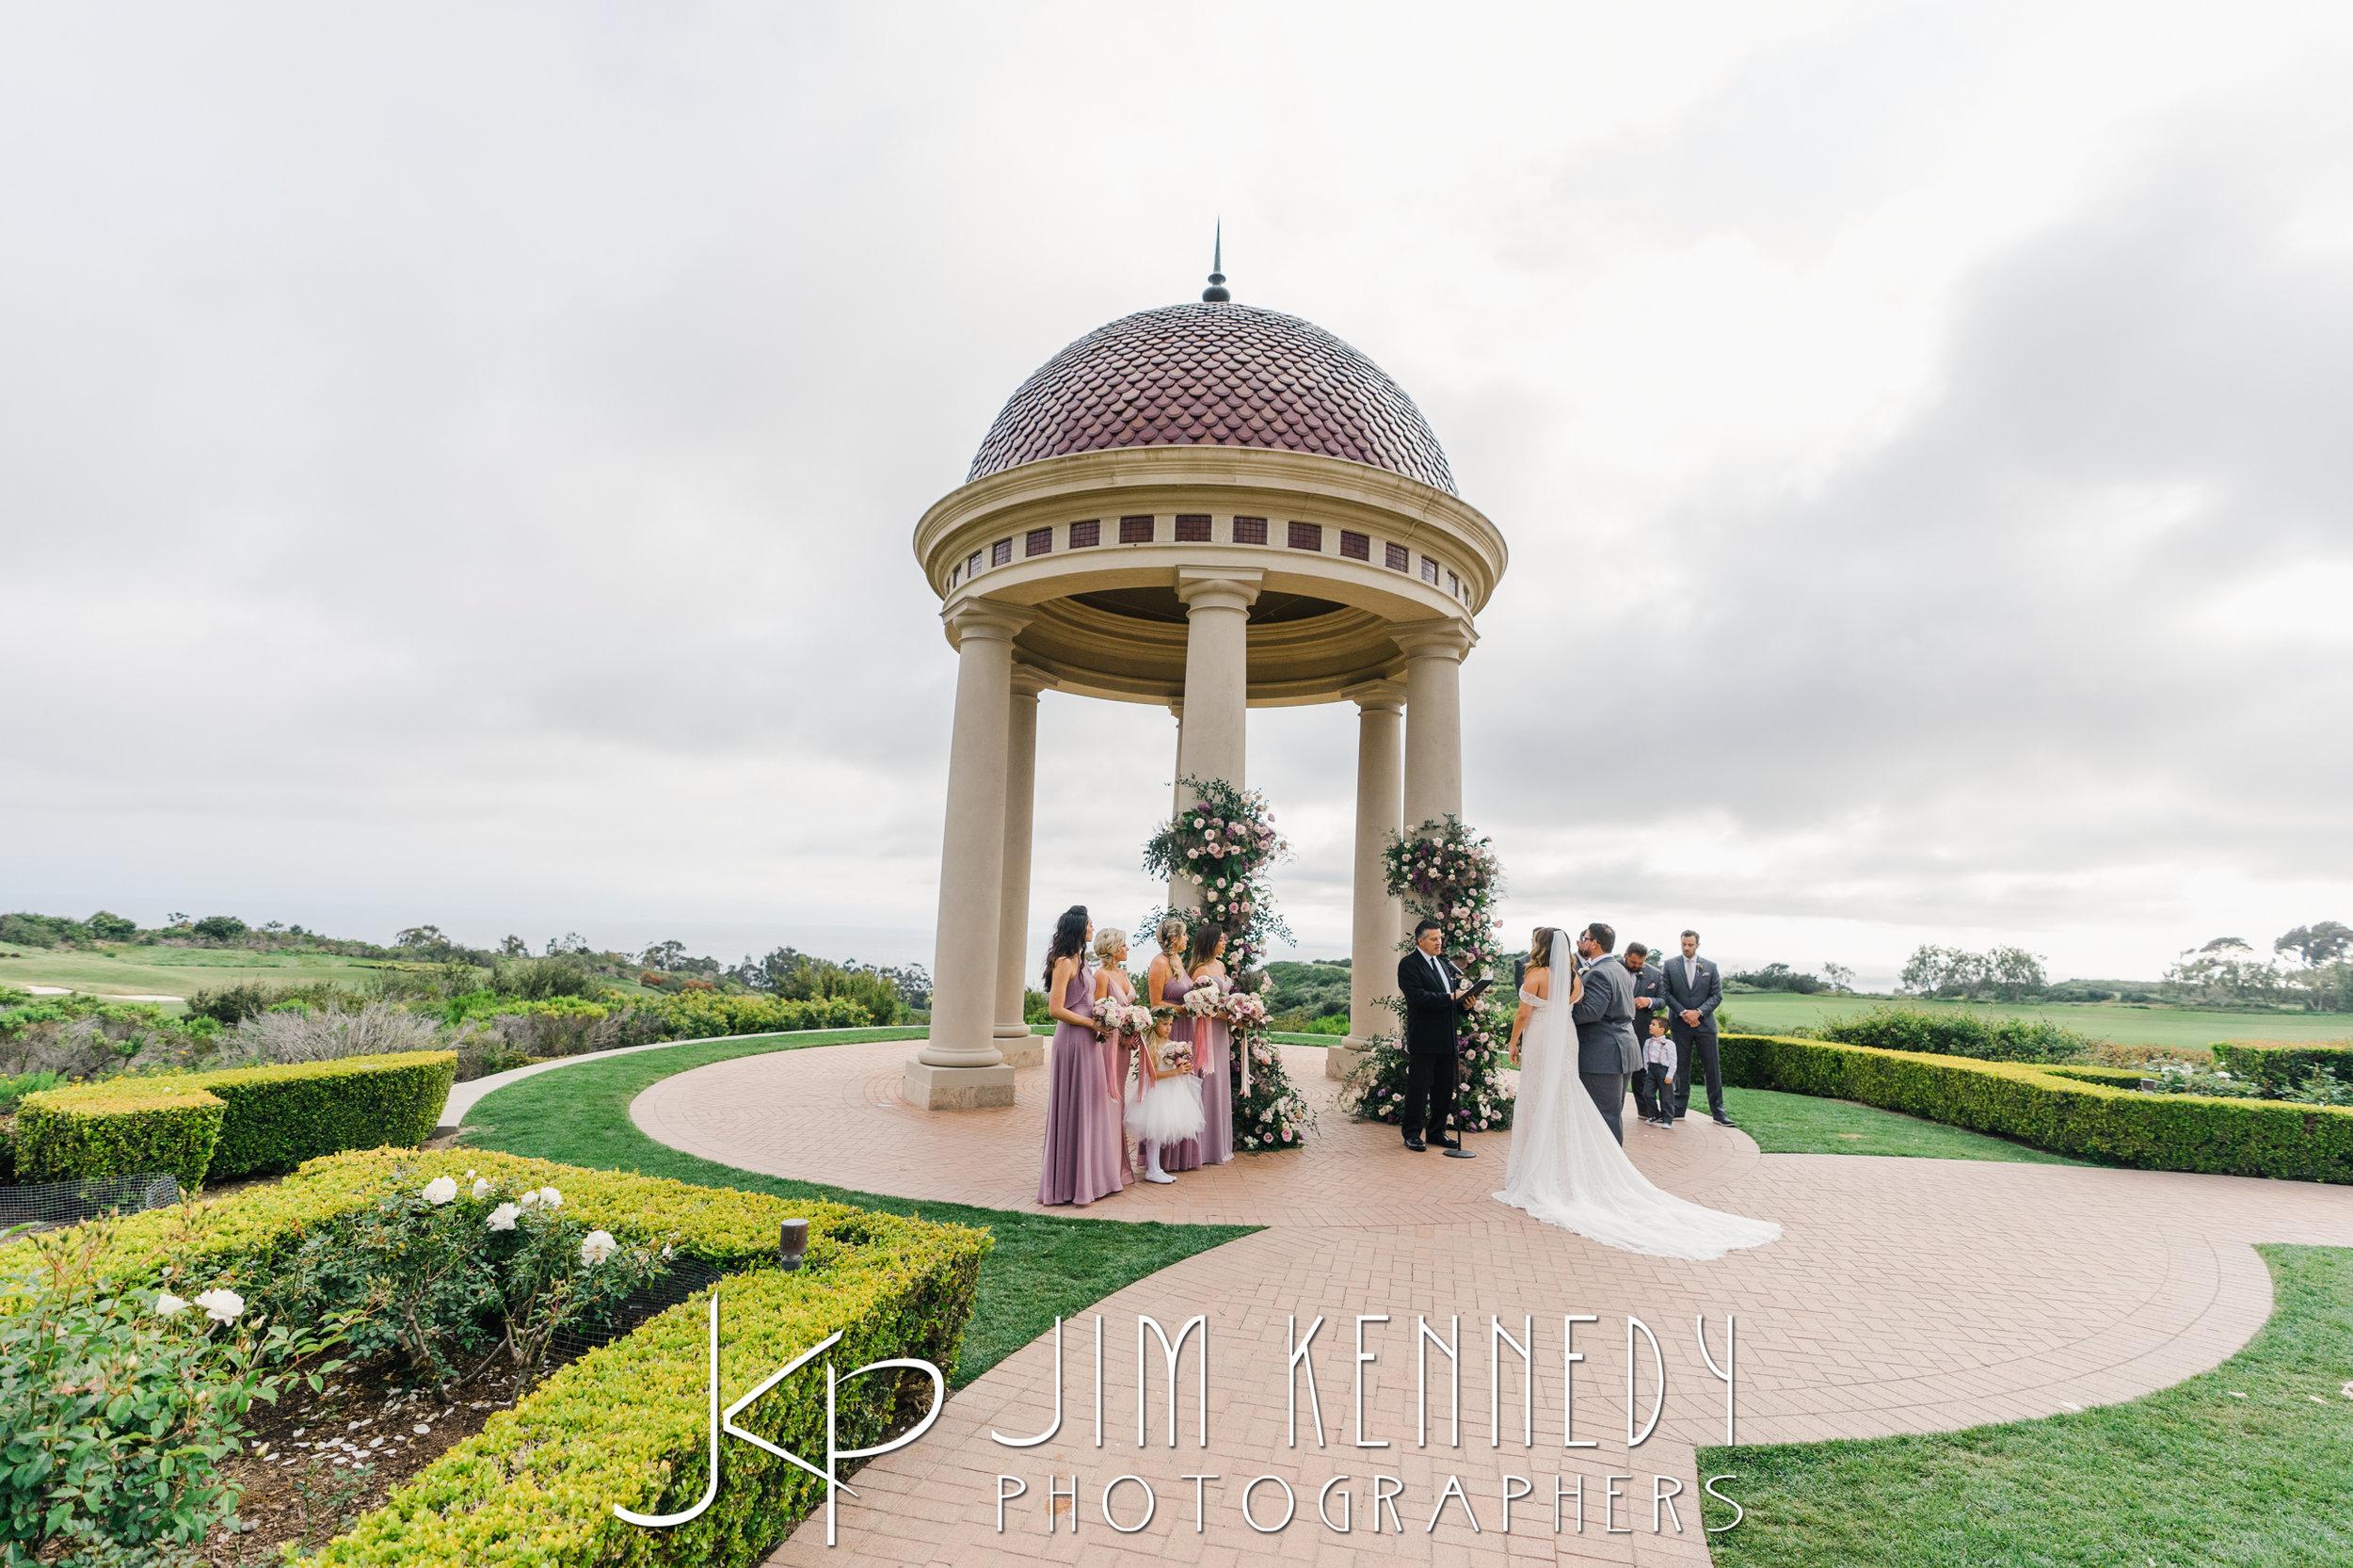 pelican-hill-wedding-jim-kenedy-photographers_0118.JPG